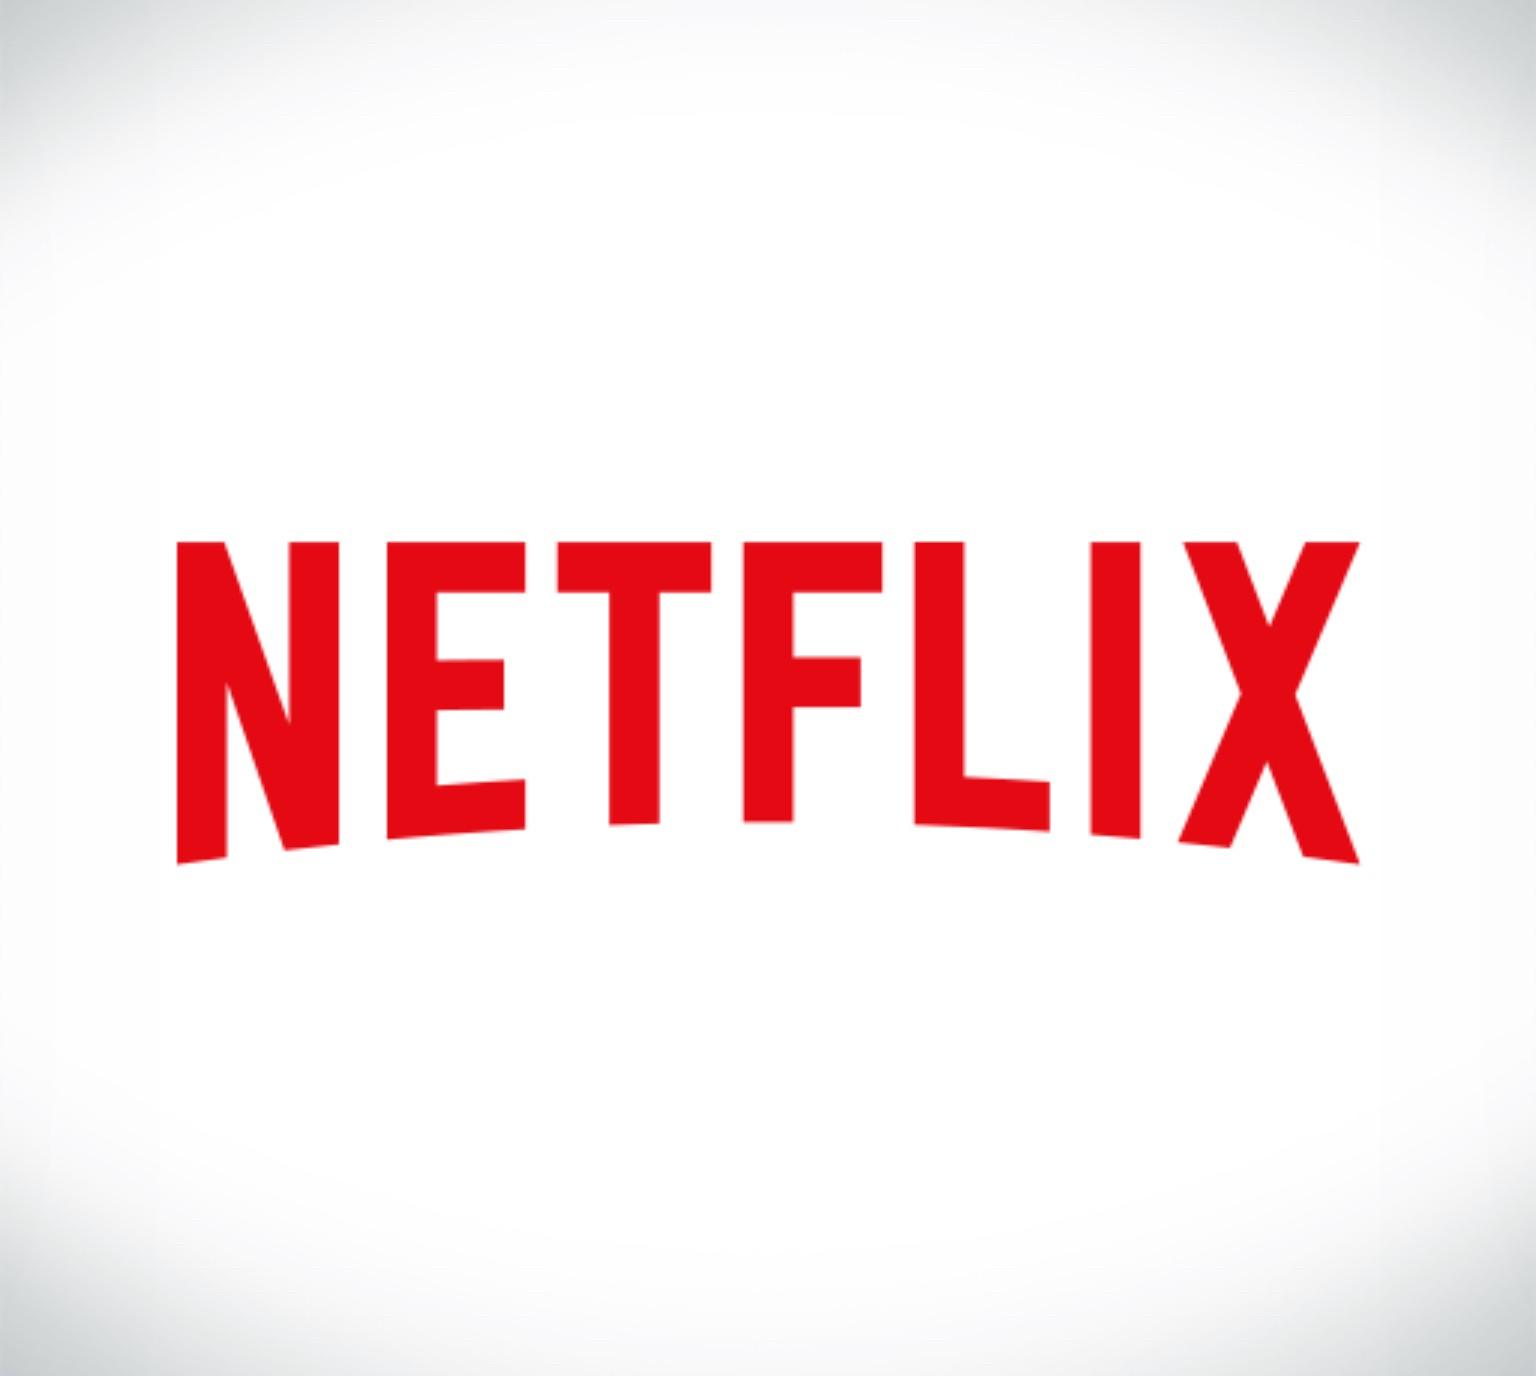 Netflix ou chaîne télé ?